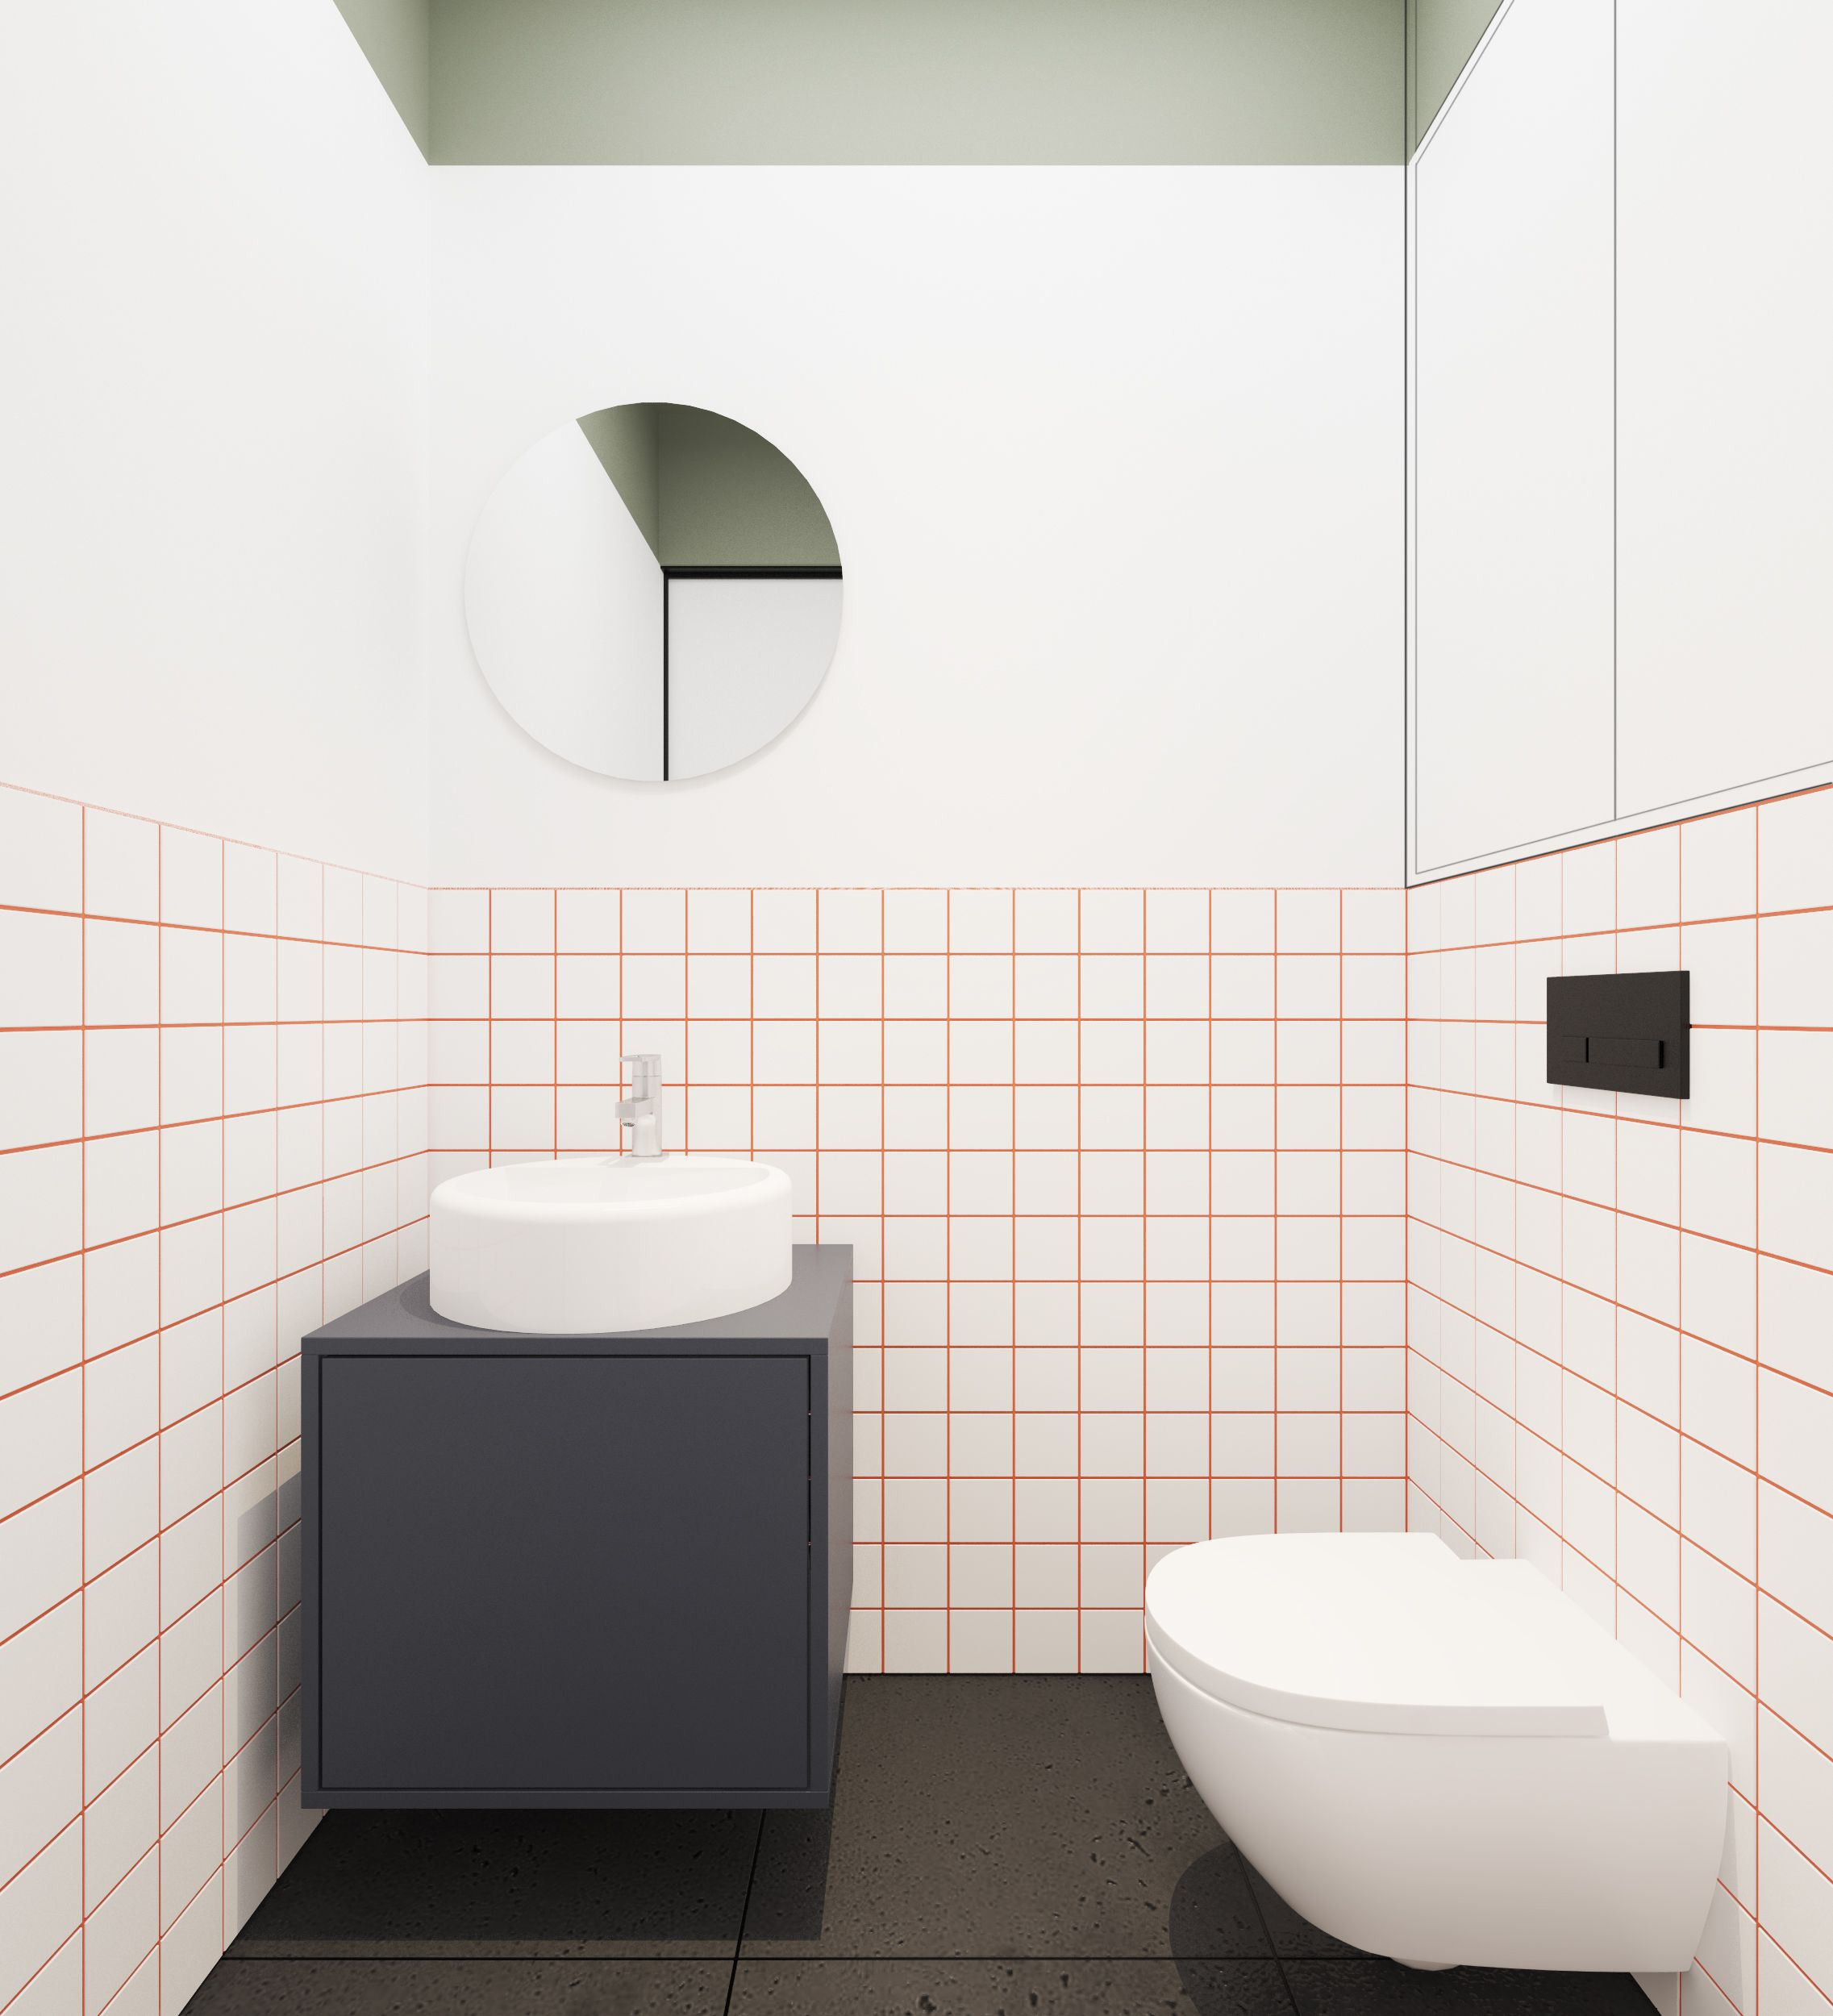 thirty eight on Behance | Bathrooms | Pinterest | Behance, Bath and ...